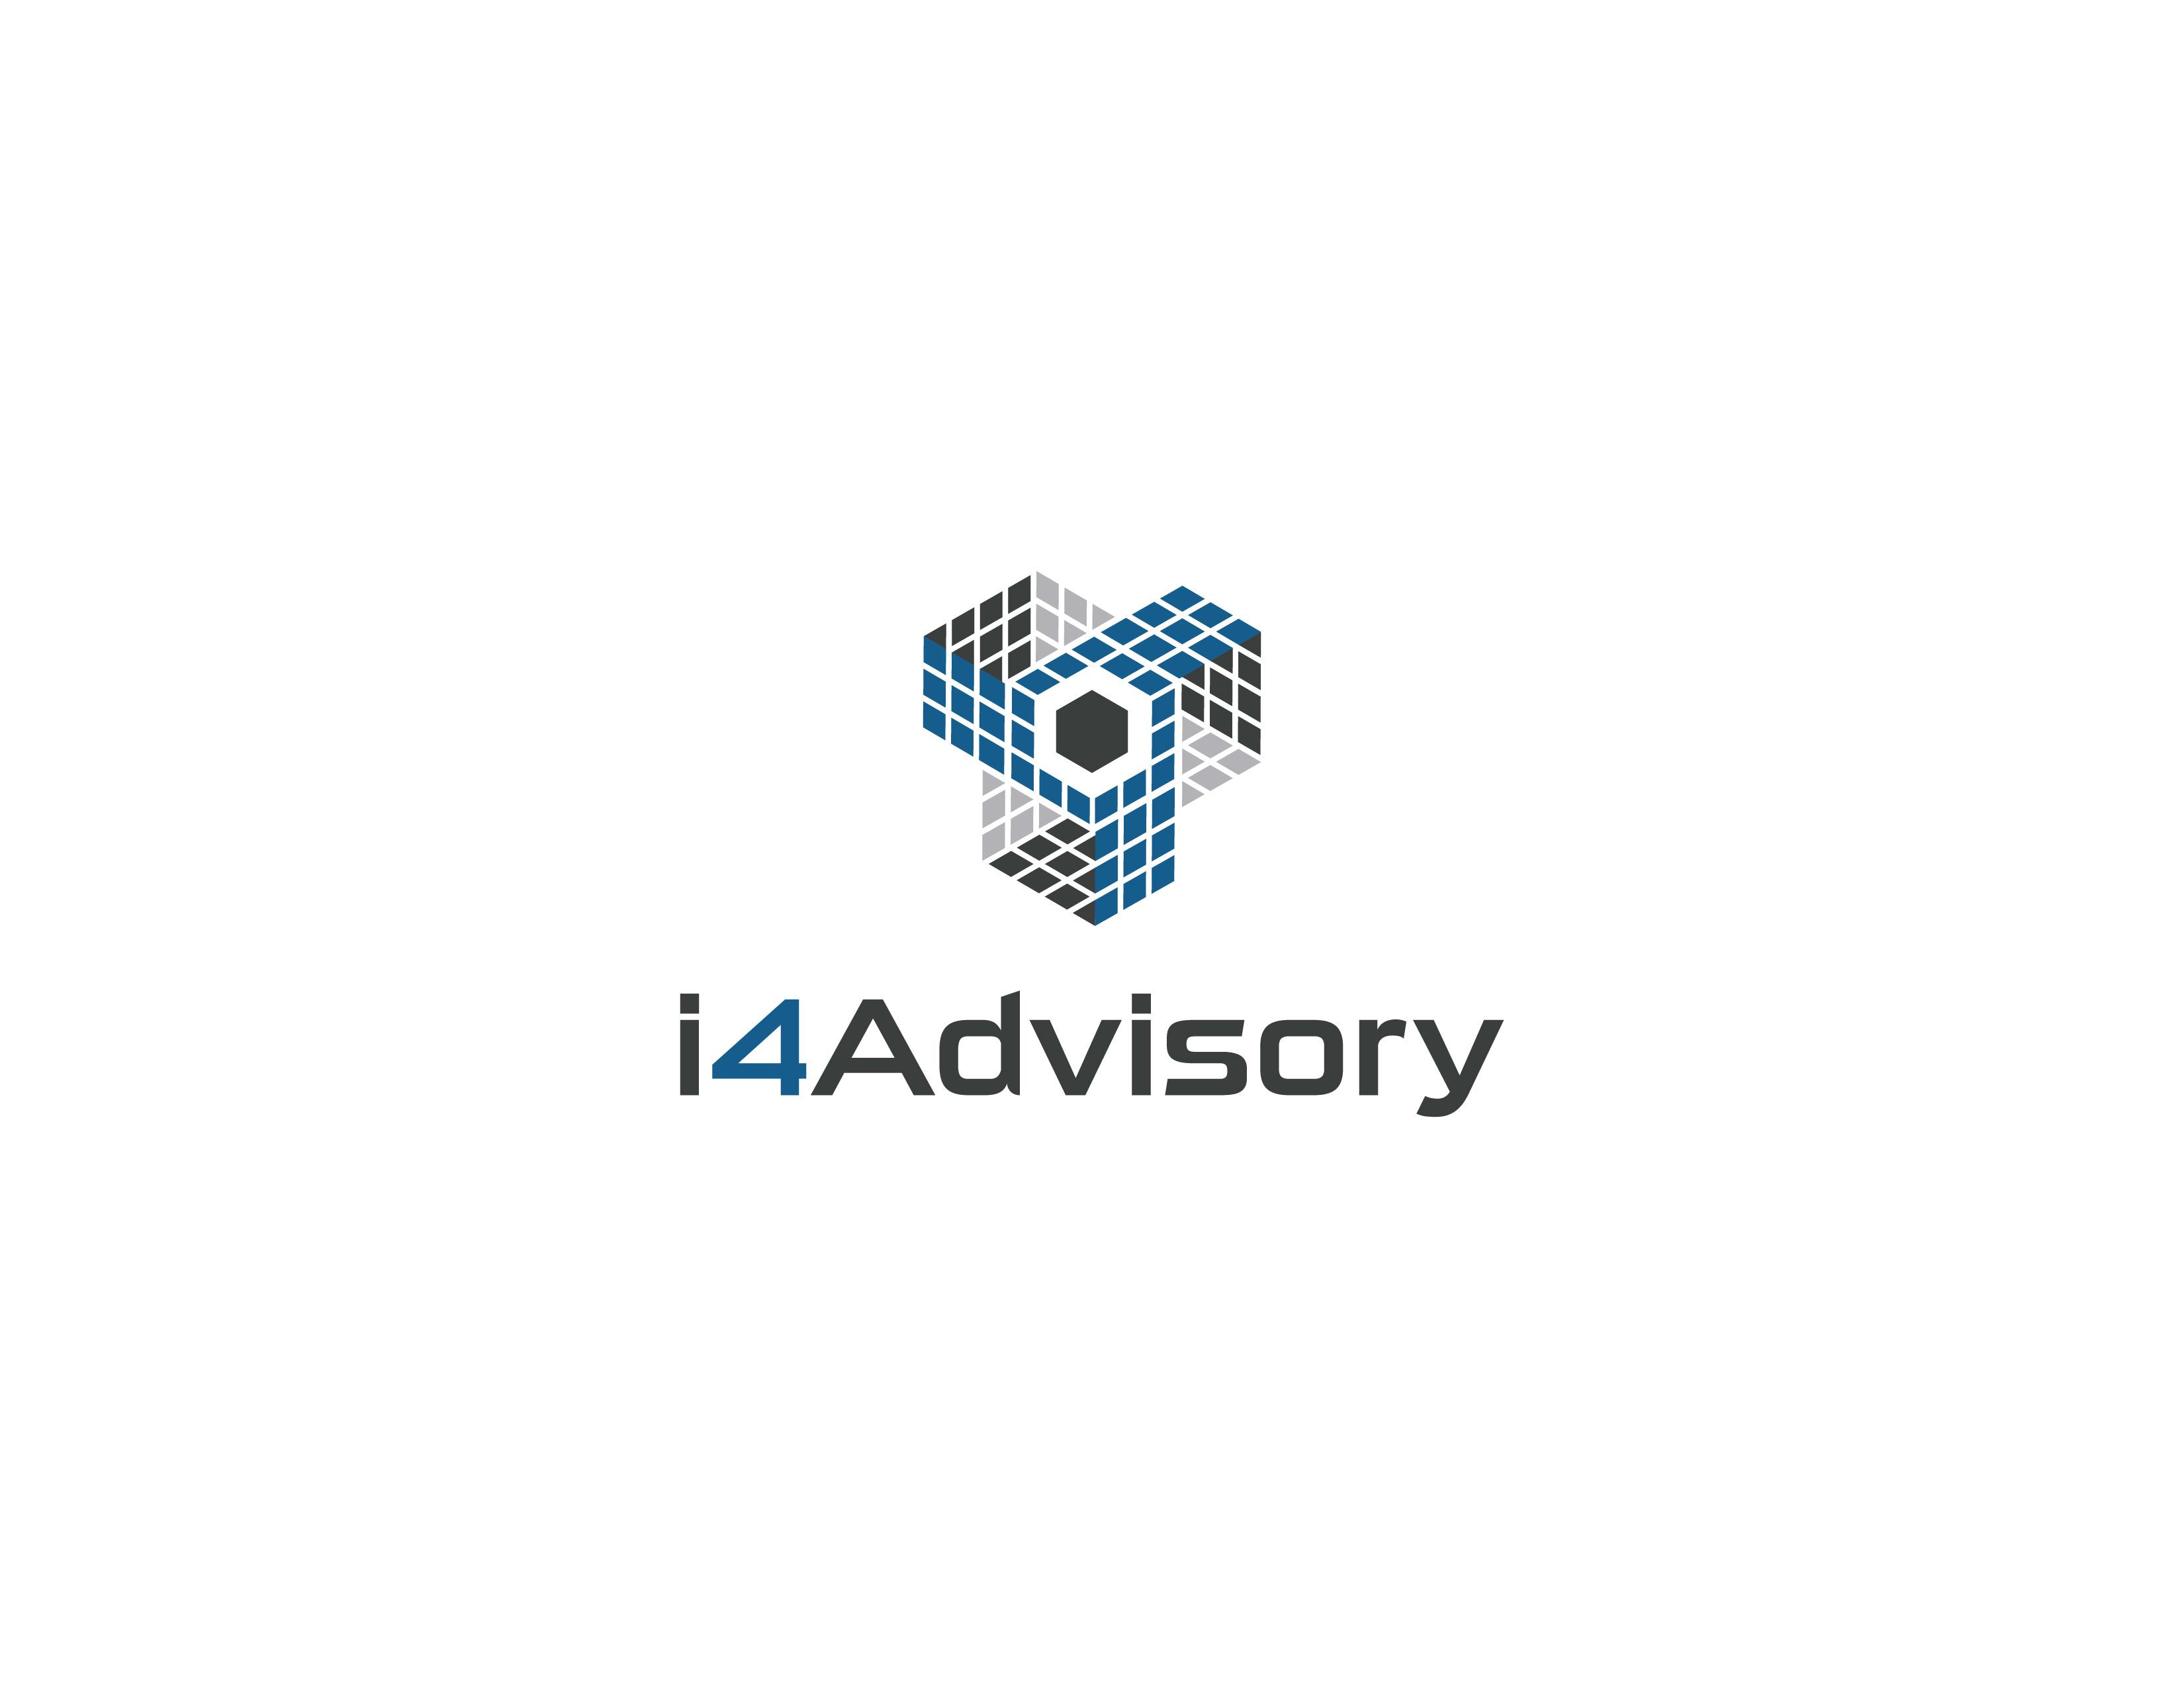 i4advisory